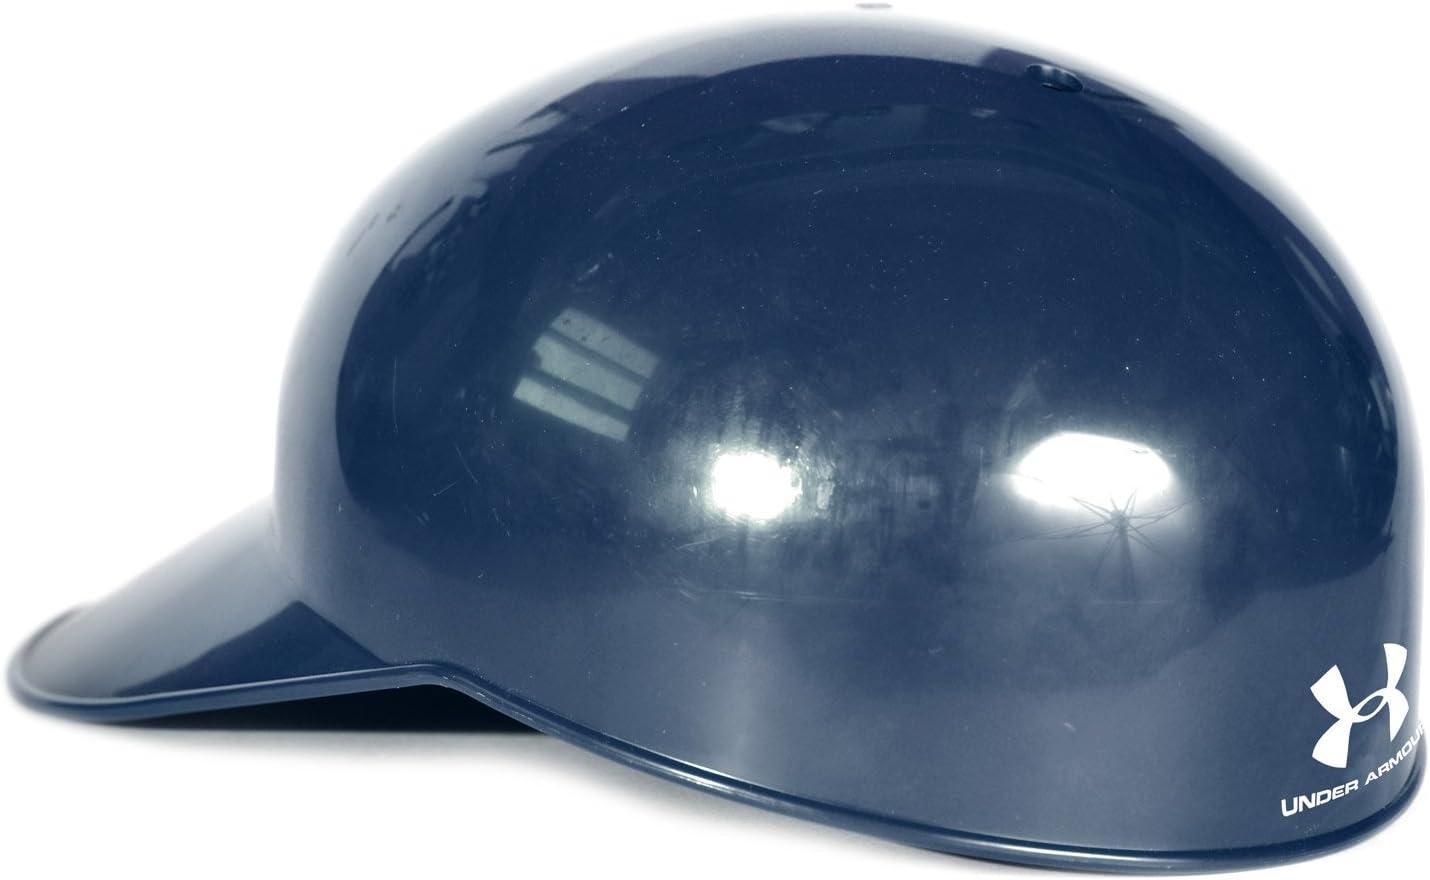 Under Armour Super sale period excellence limited Pro Helmets Coaches Catchers